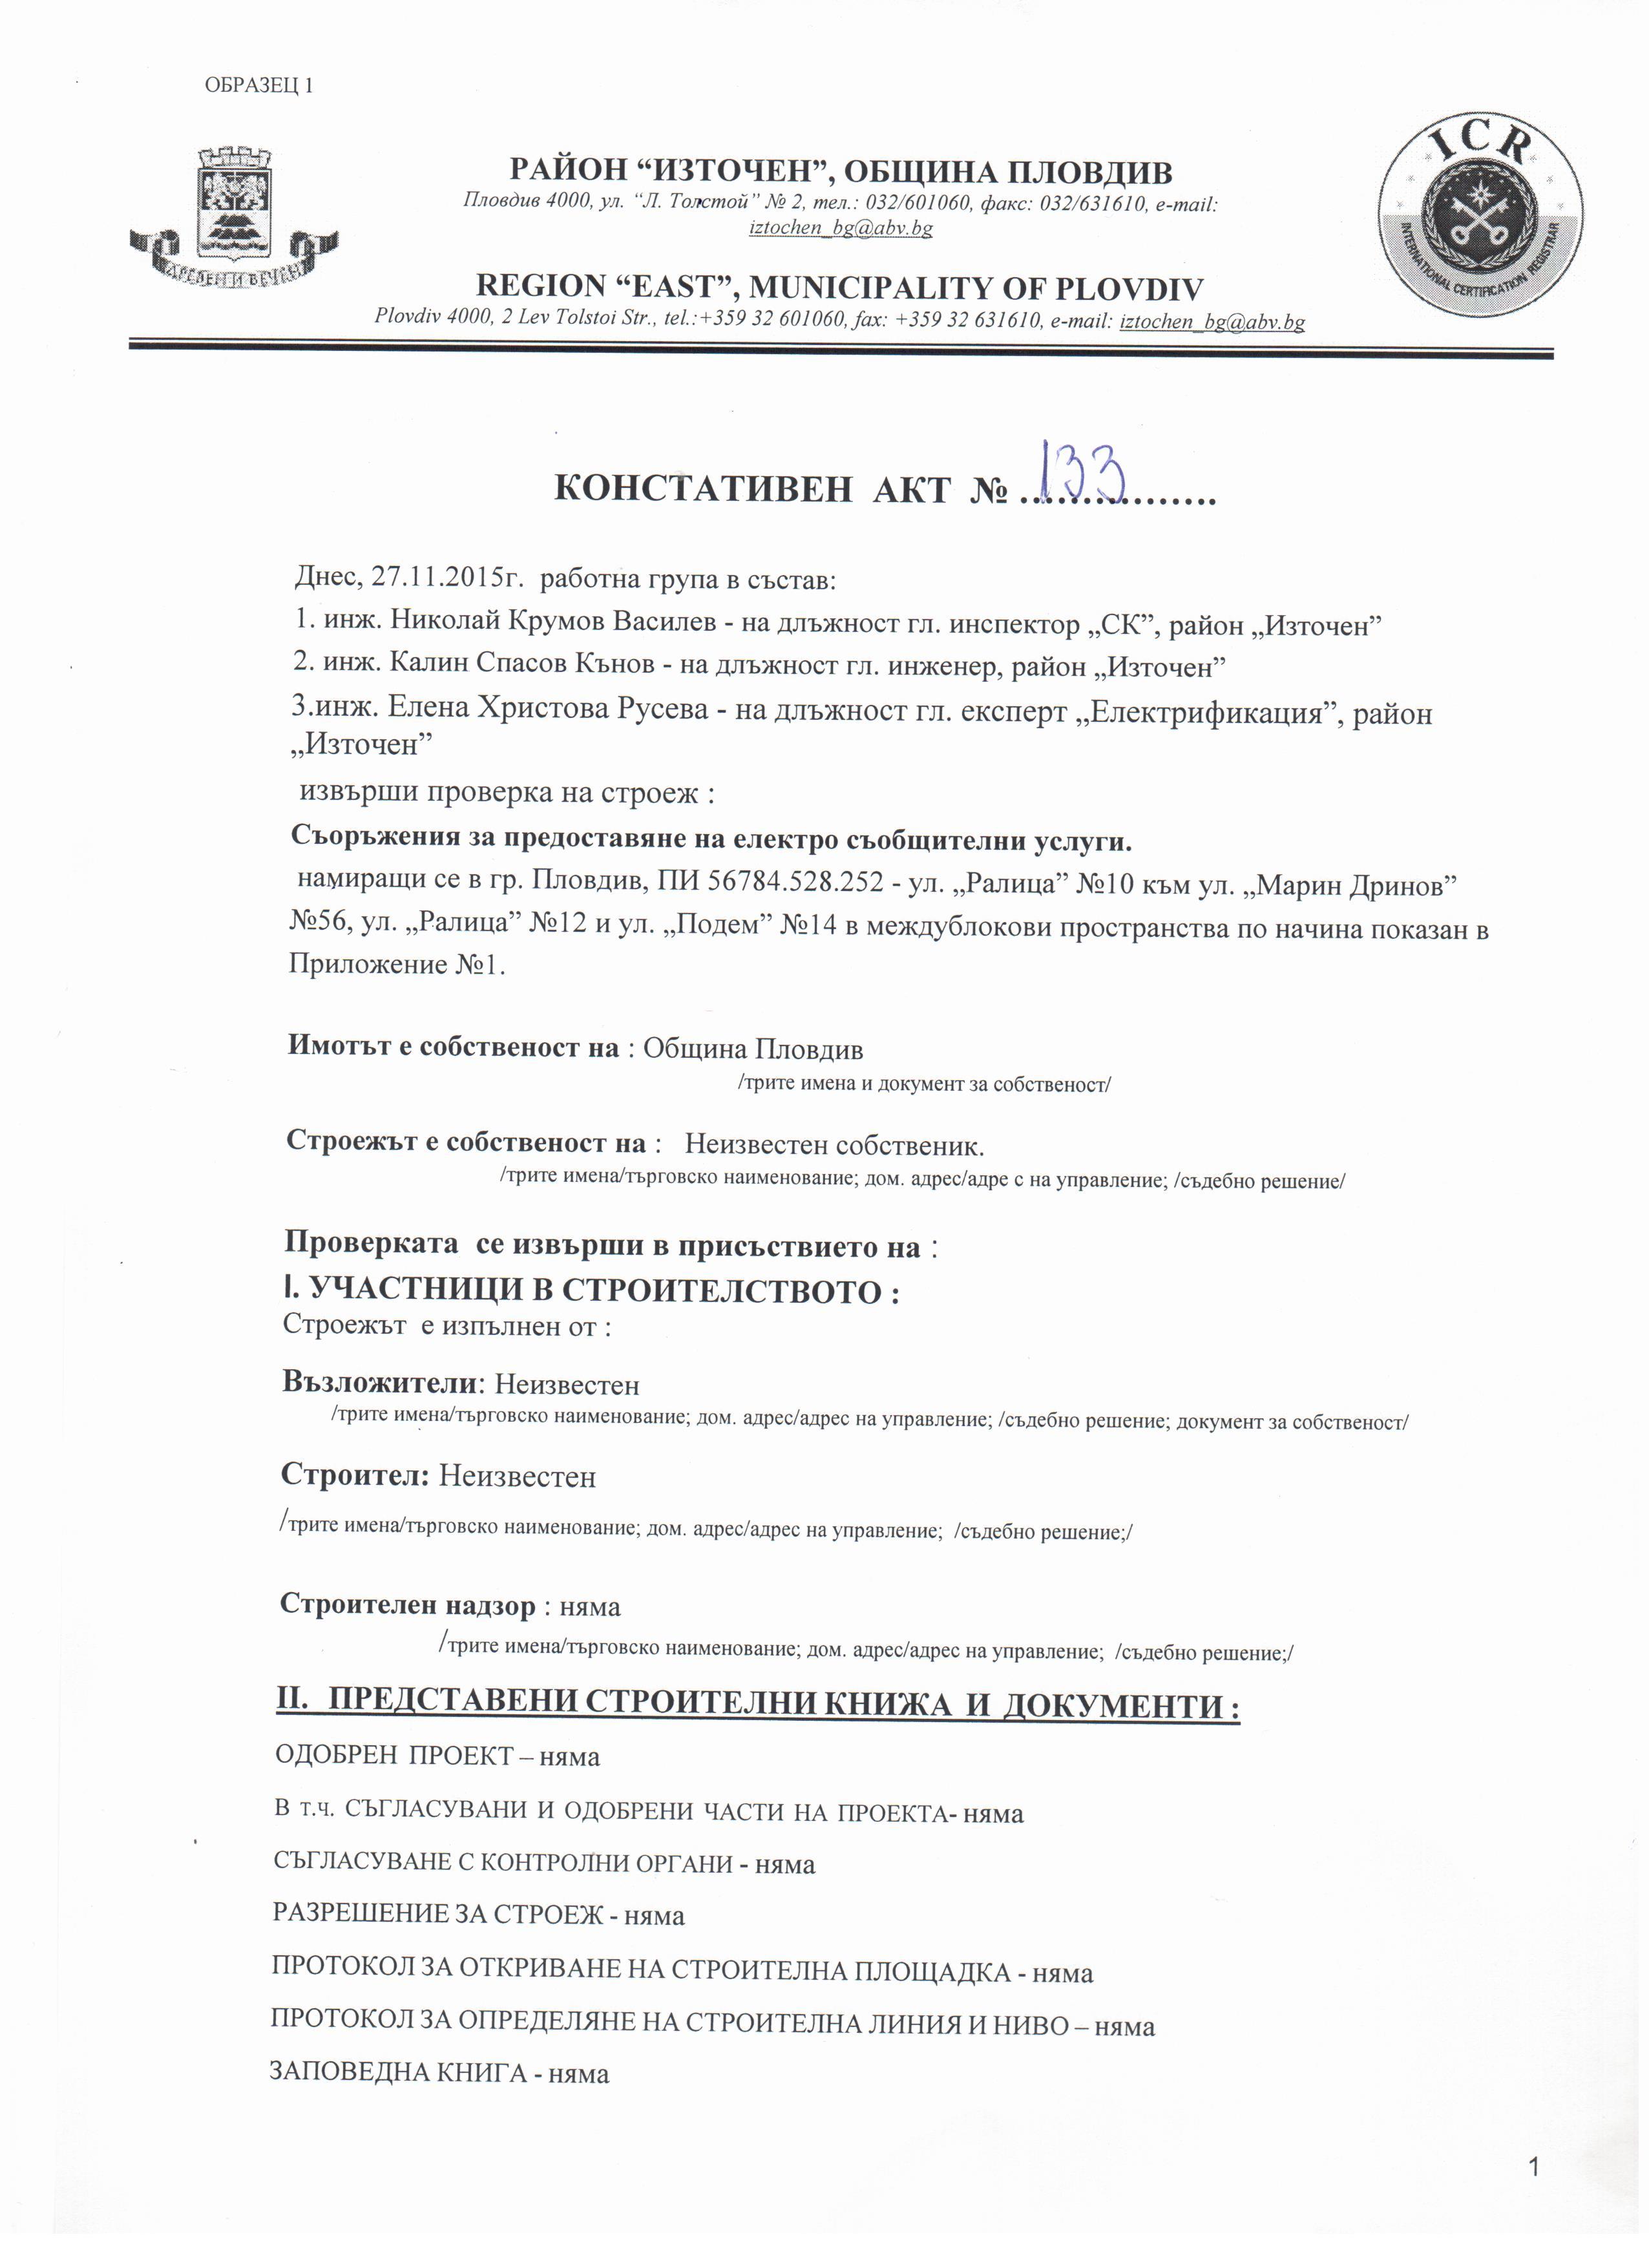 KONSTATIVEN_AKT_№133